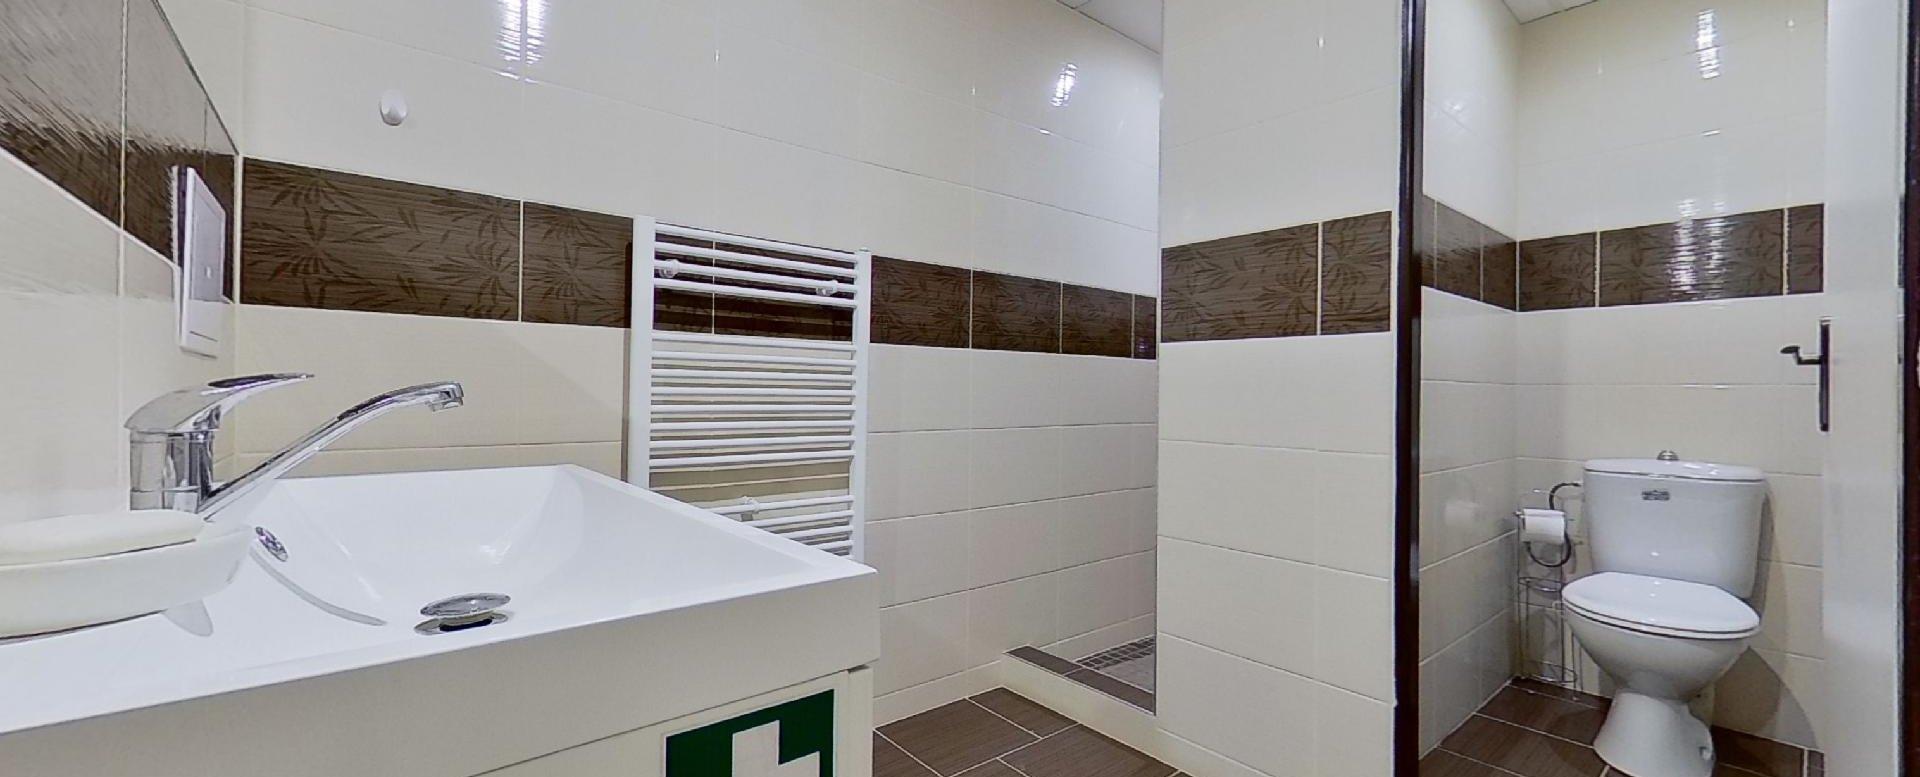 kúpeľna a toaleta